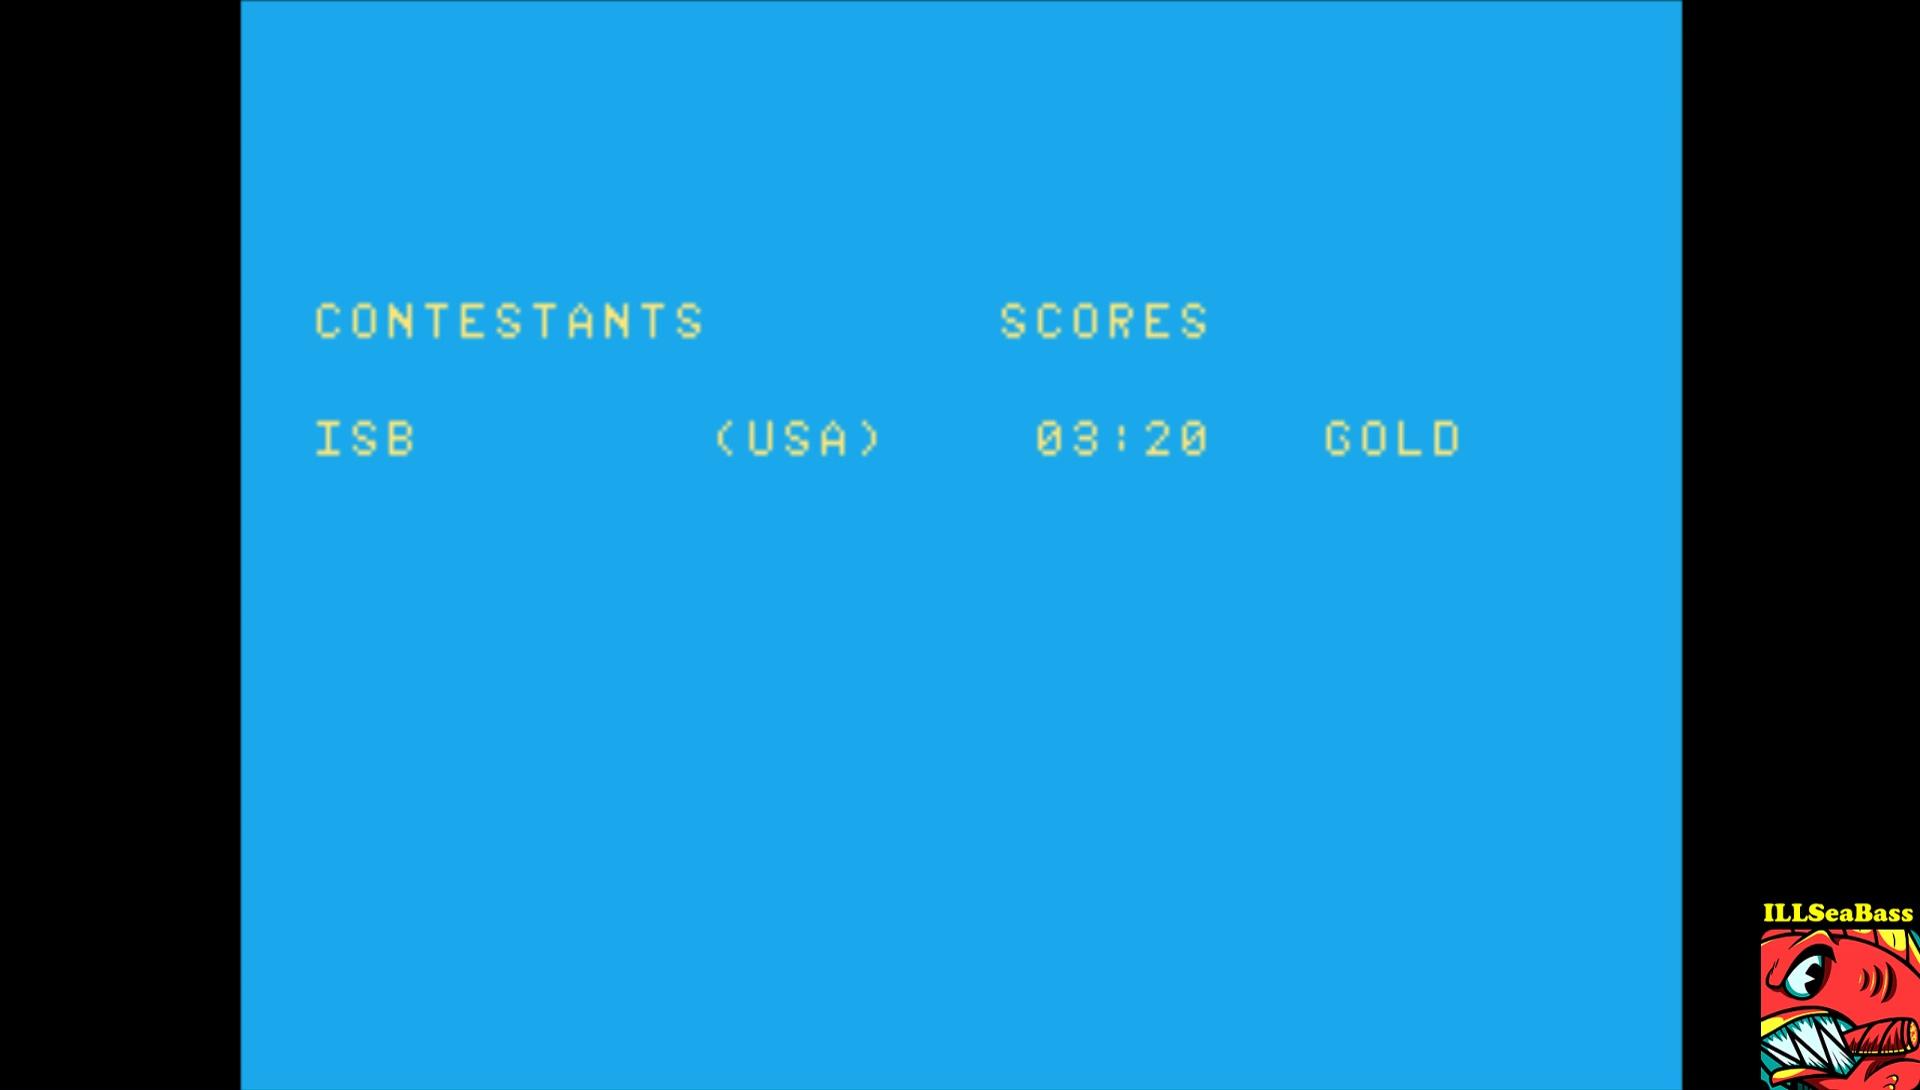 ILLSeaBass: Winter Games: Biathalon (Atari 7800 Emulated) 0:03:20 points on 2017-02-16 21:39:58